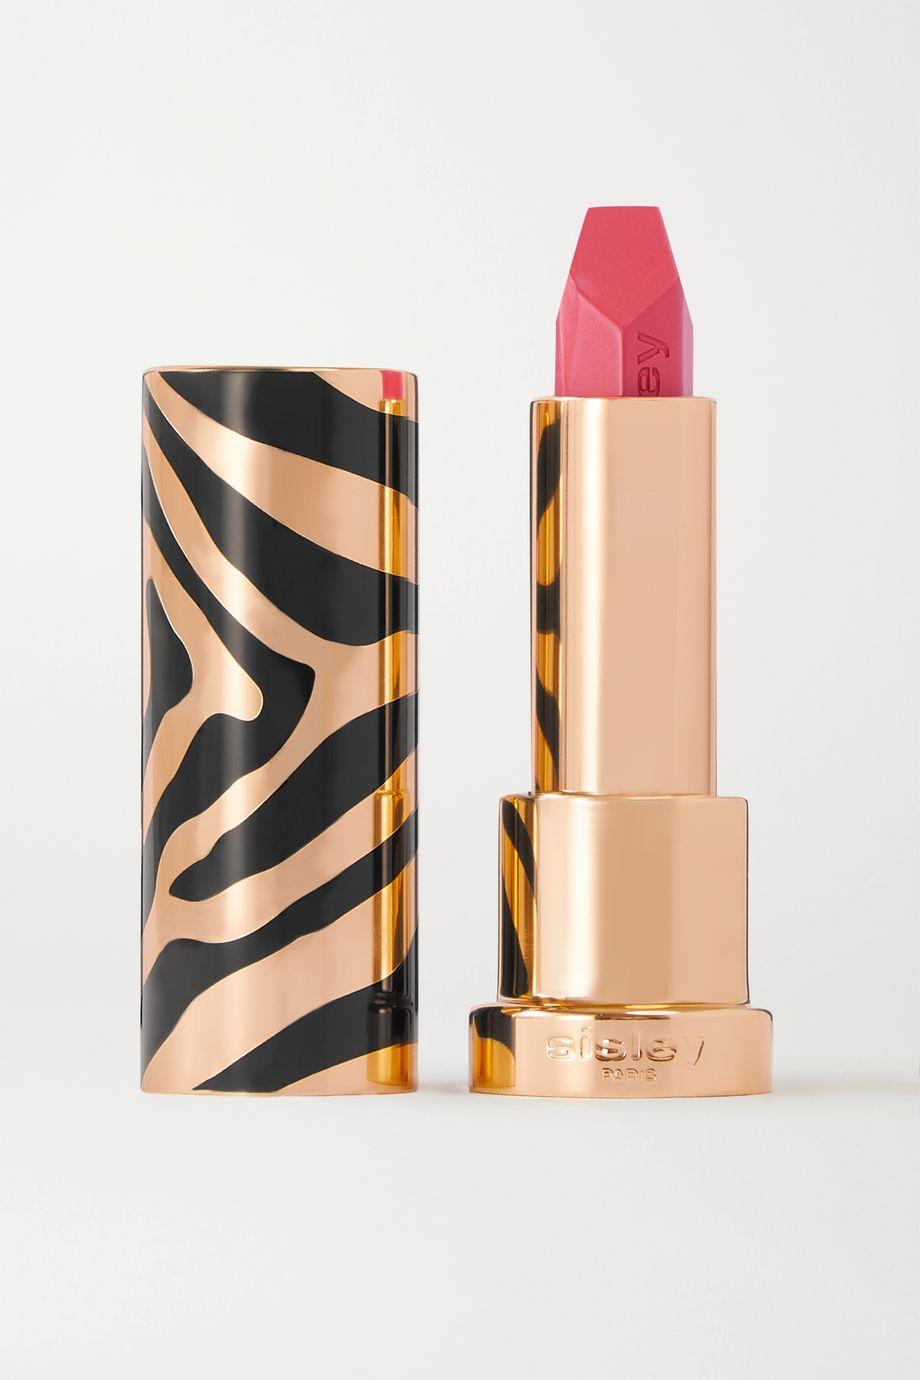 Sisley Le Phyto Rouge Lipstick - 22 Rose Paris